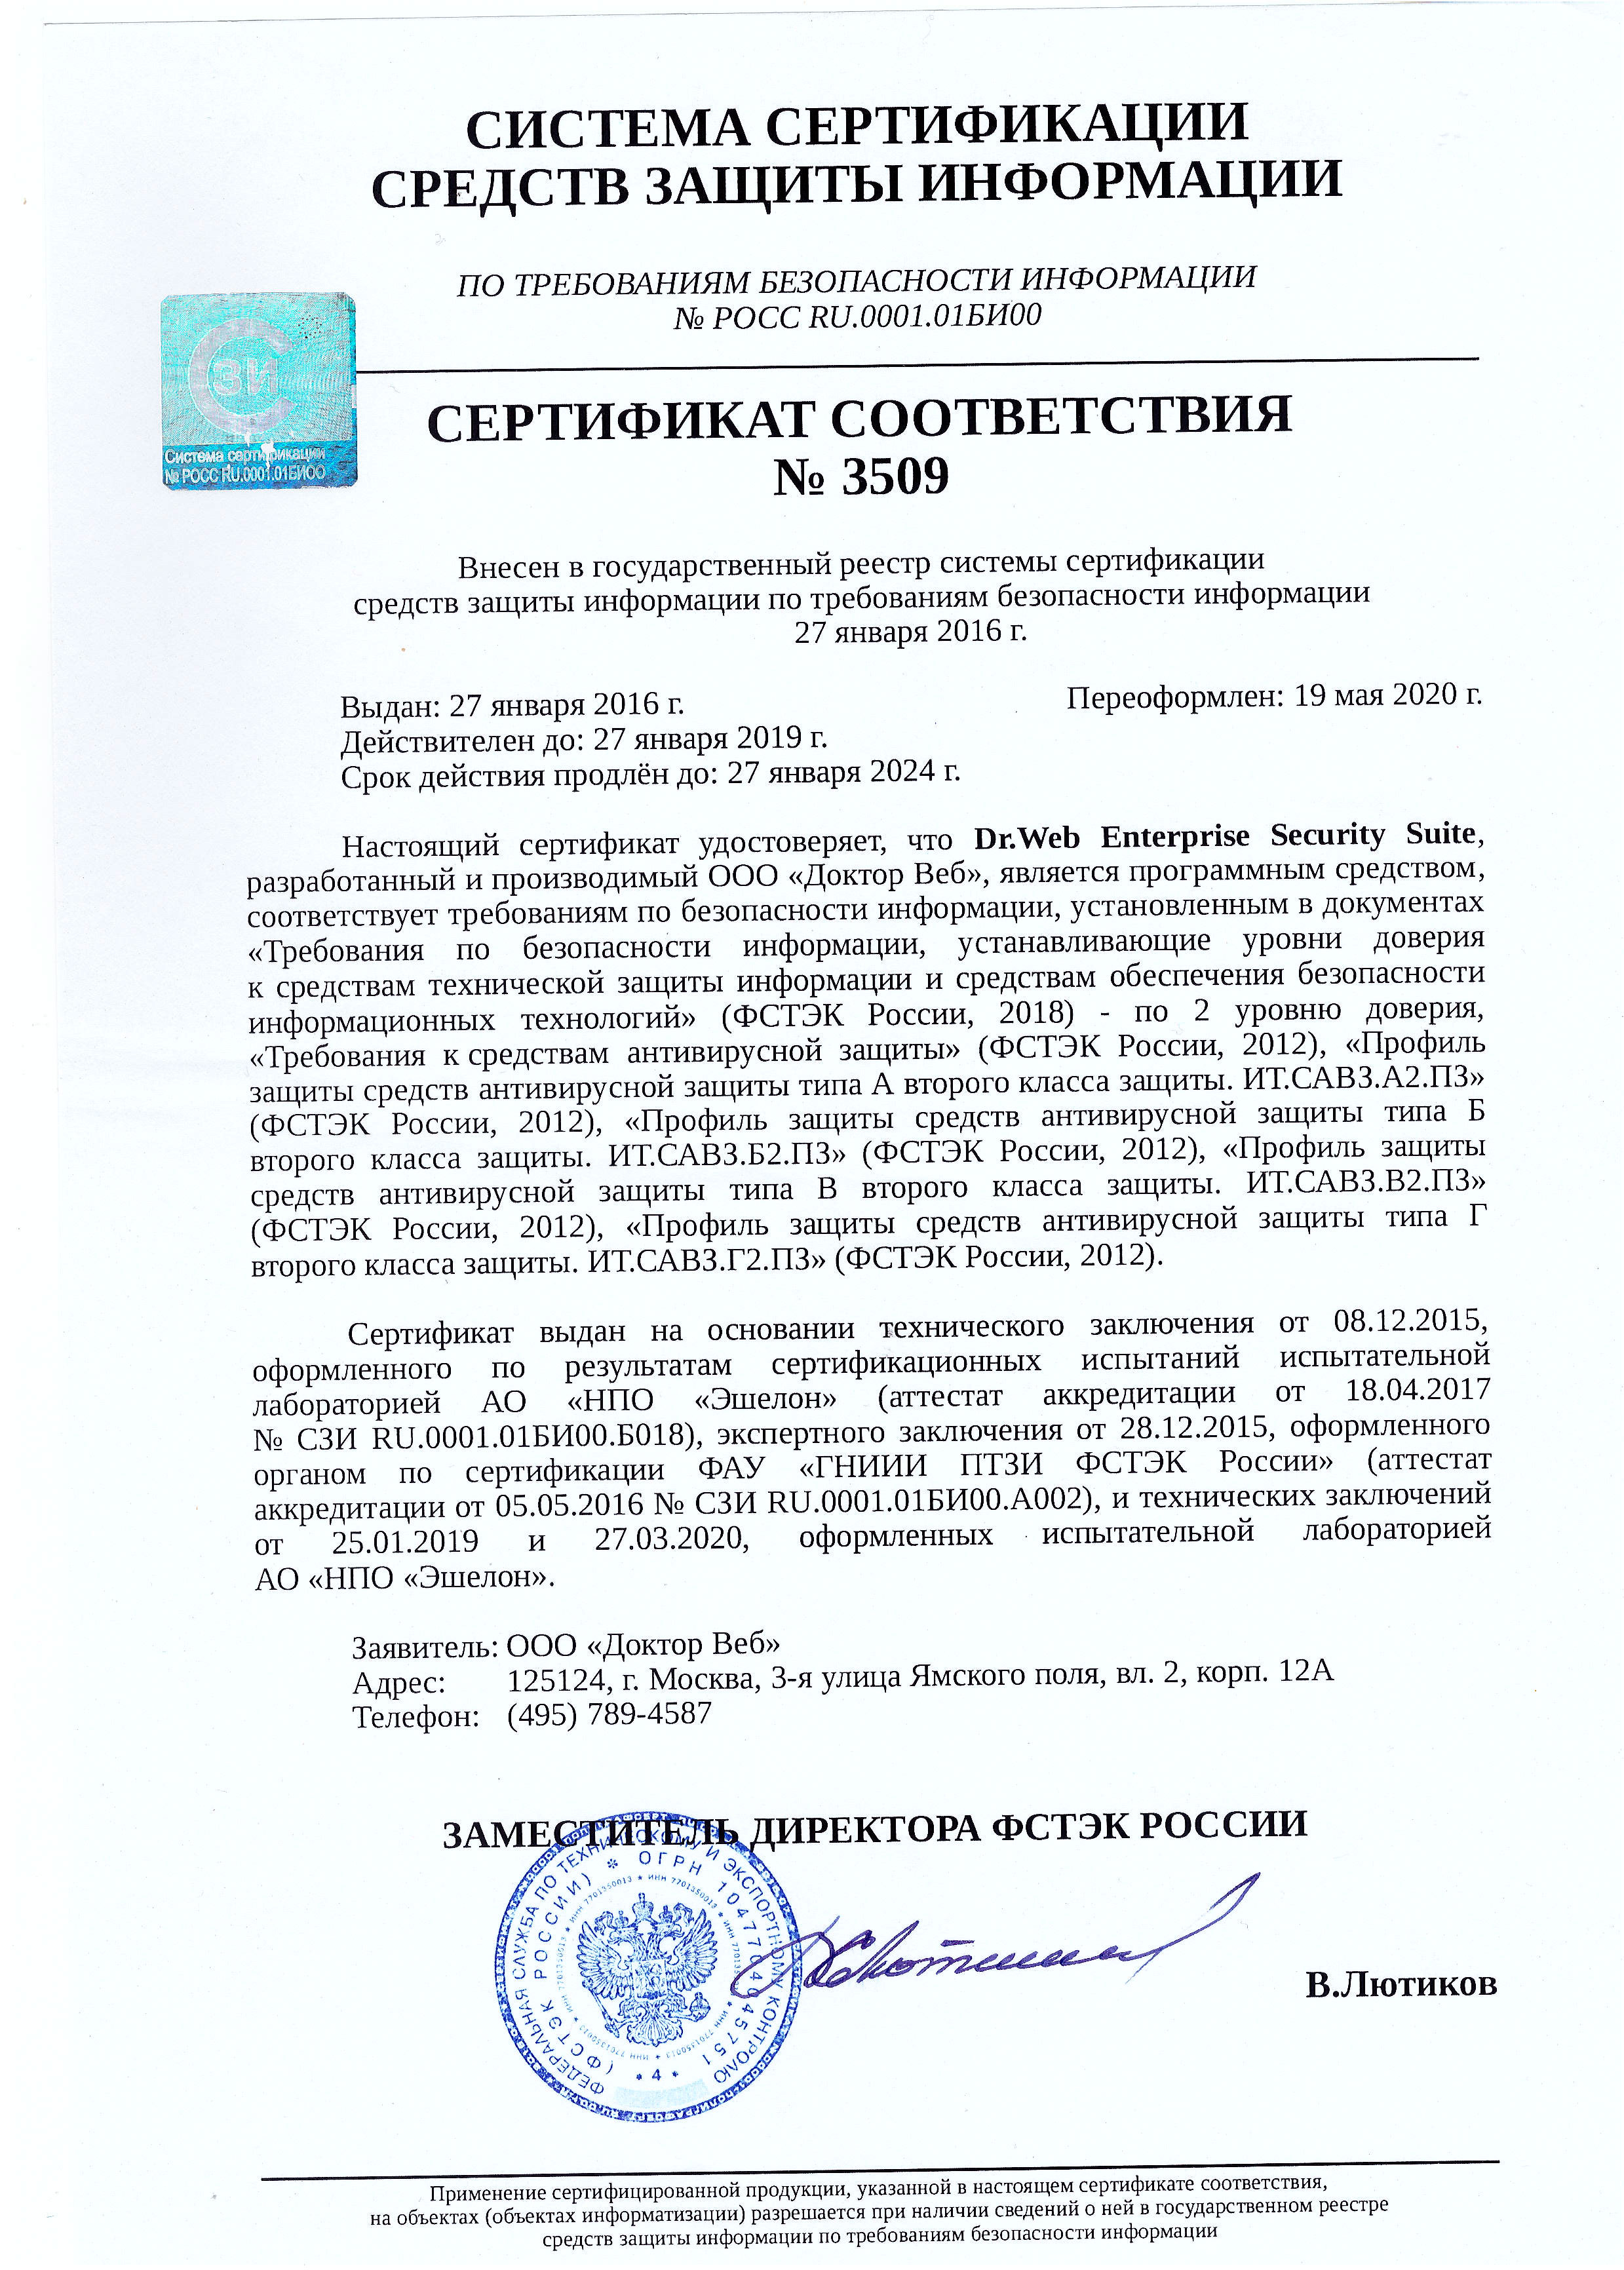 Unix сертификация добровольная сертификация туризме